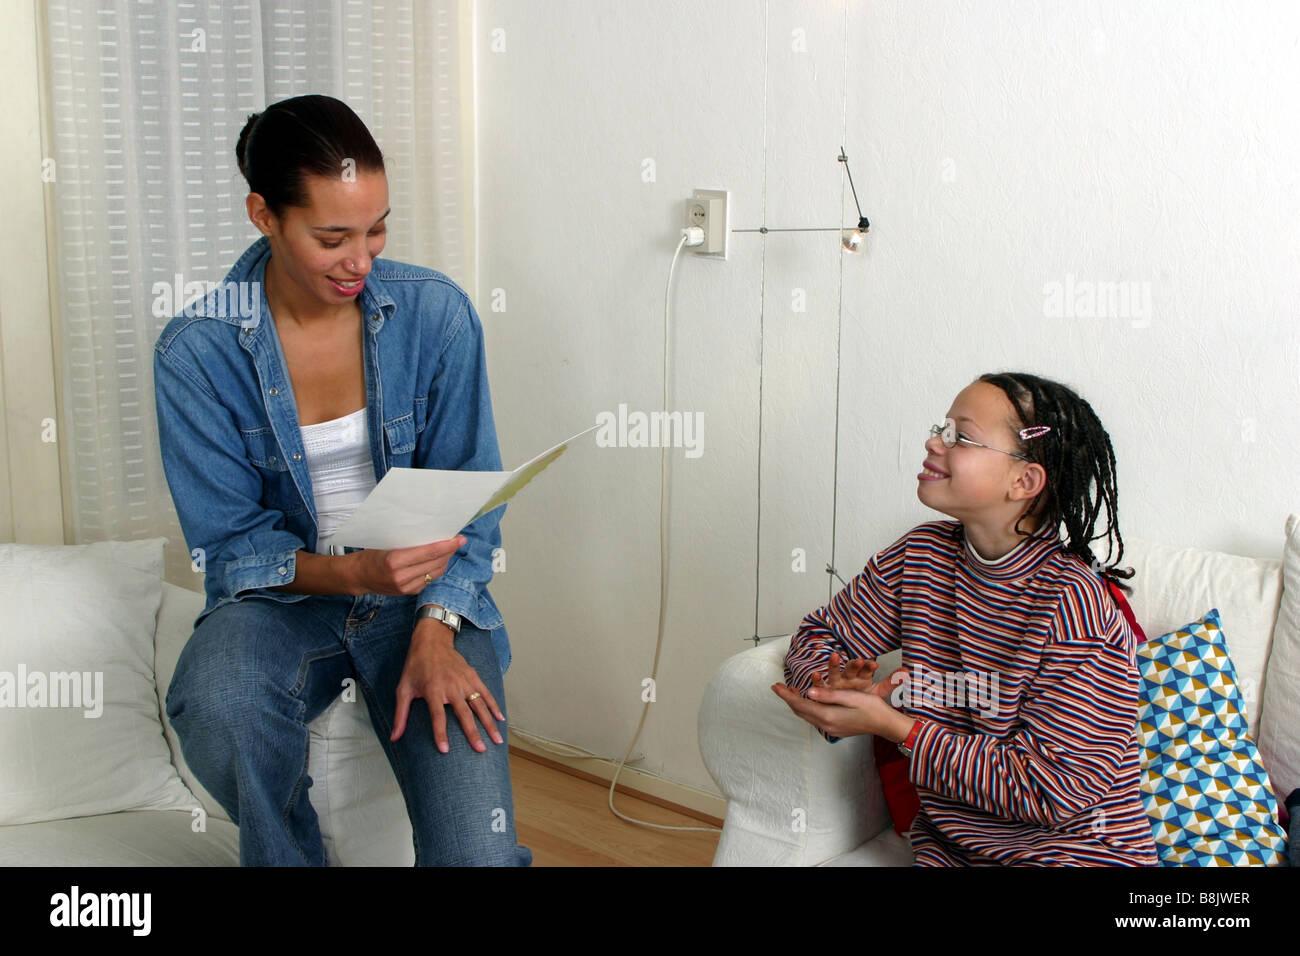 Happy mother reading report card. SerieCVS117007 - Stock Image